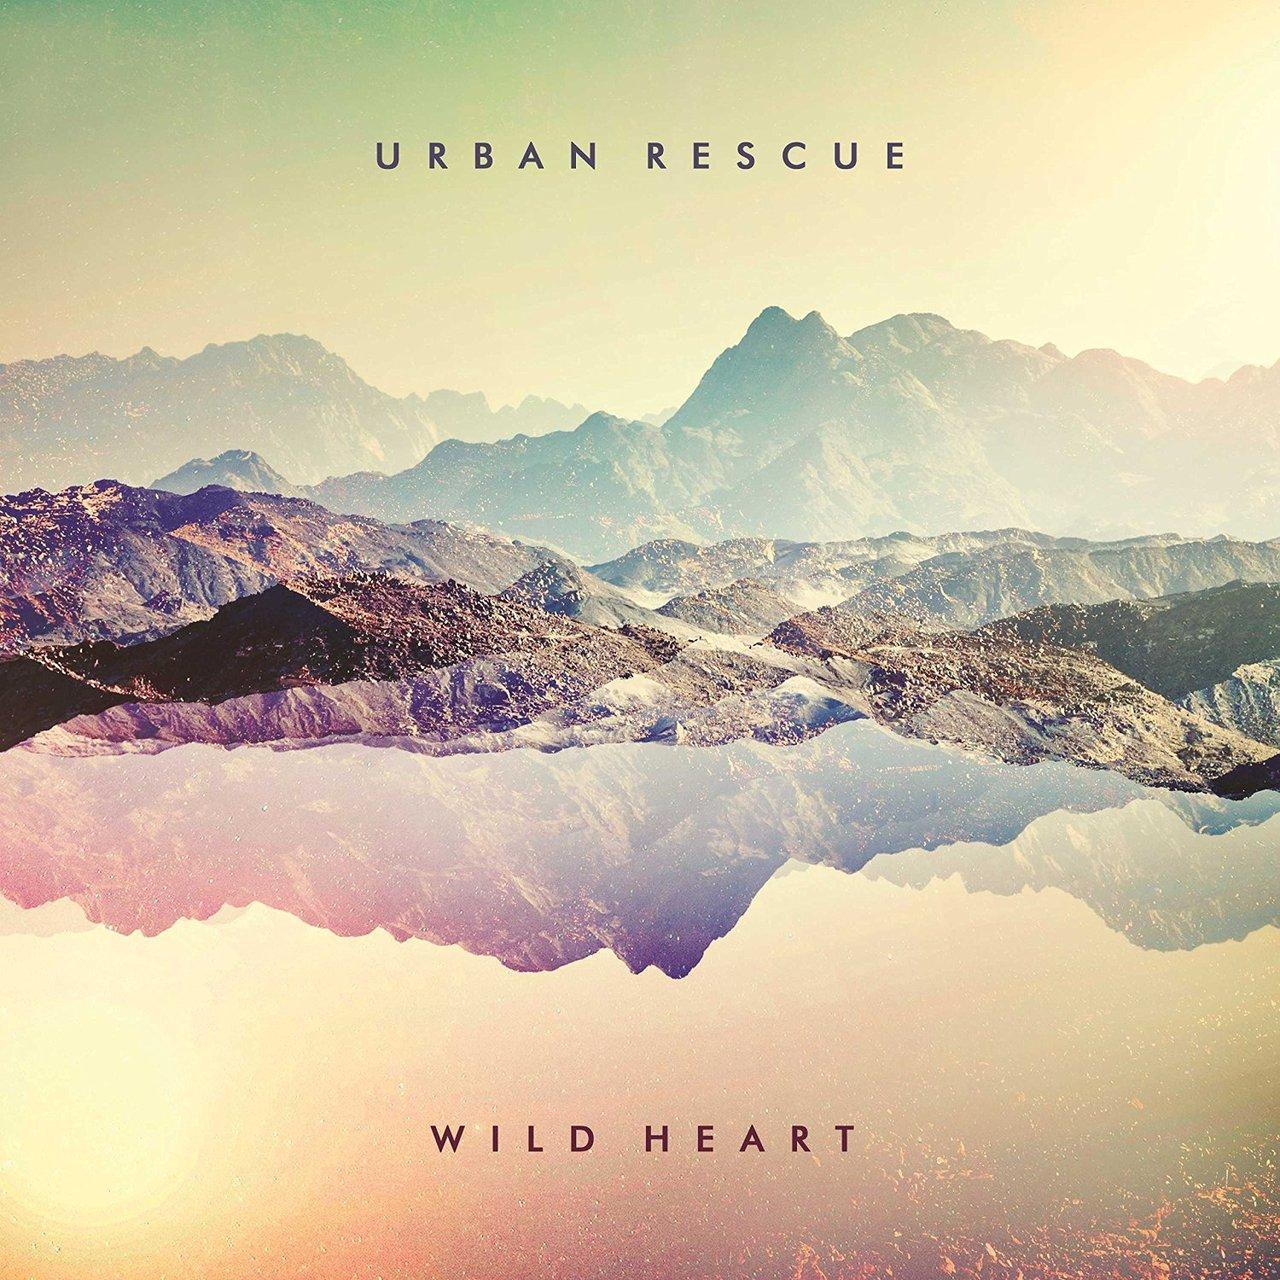 Wild heart by urban rescue